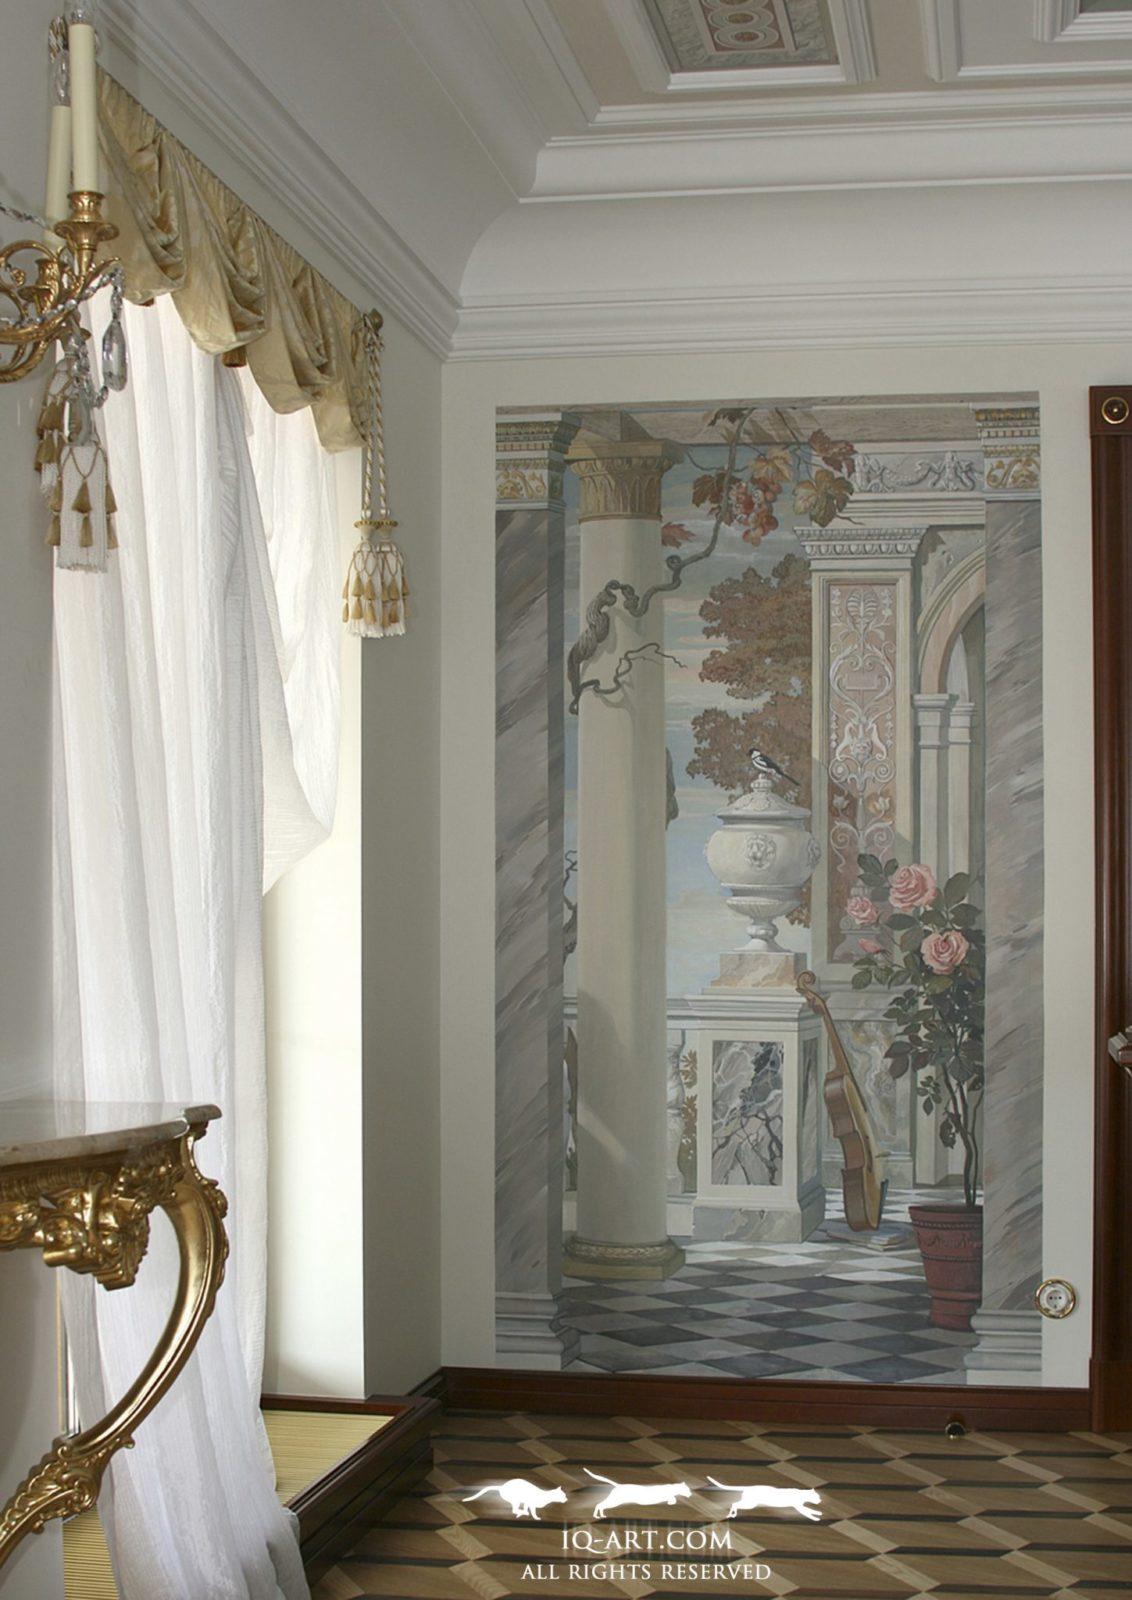 27 art interiors